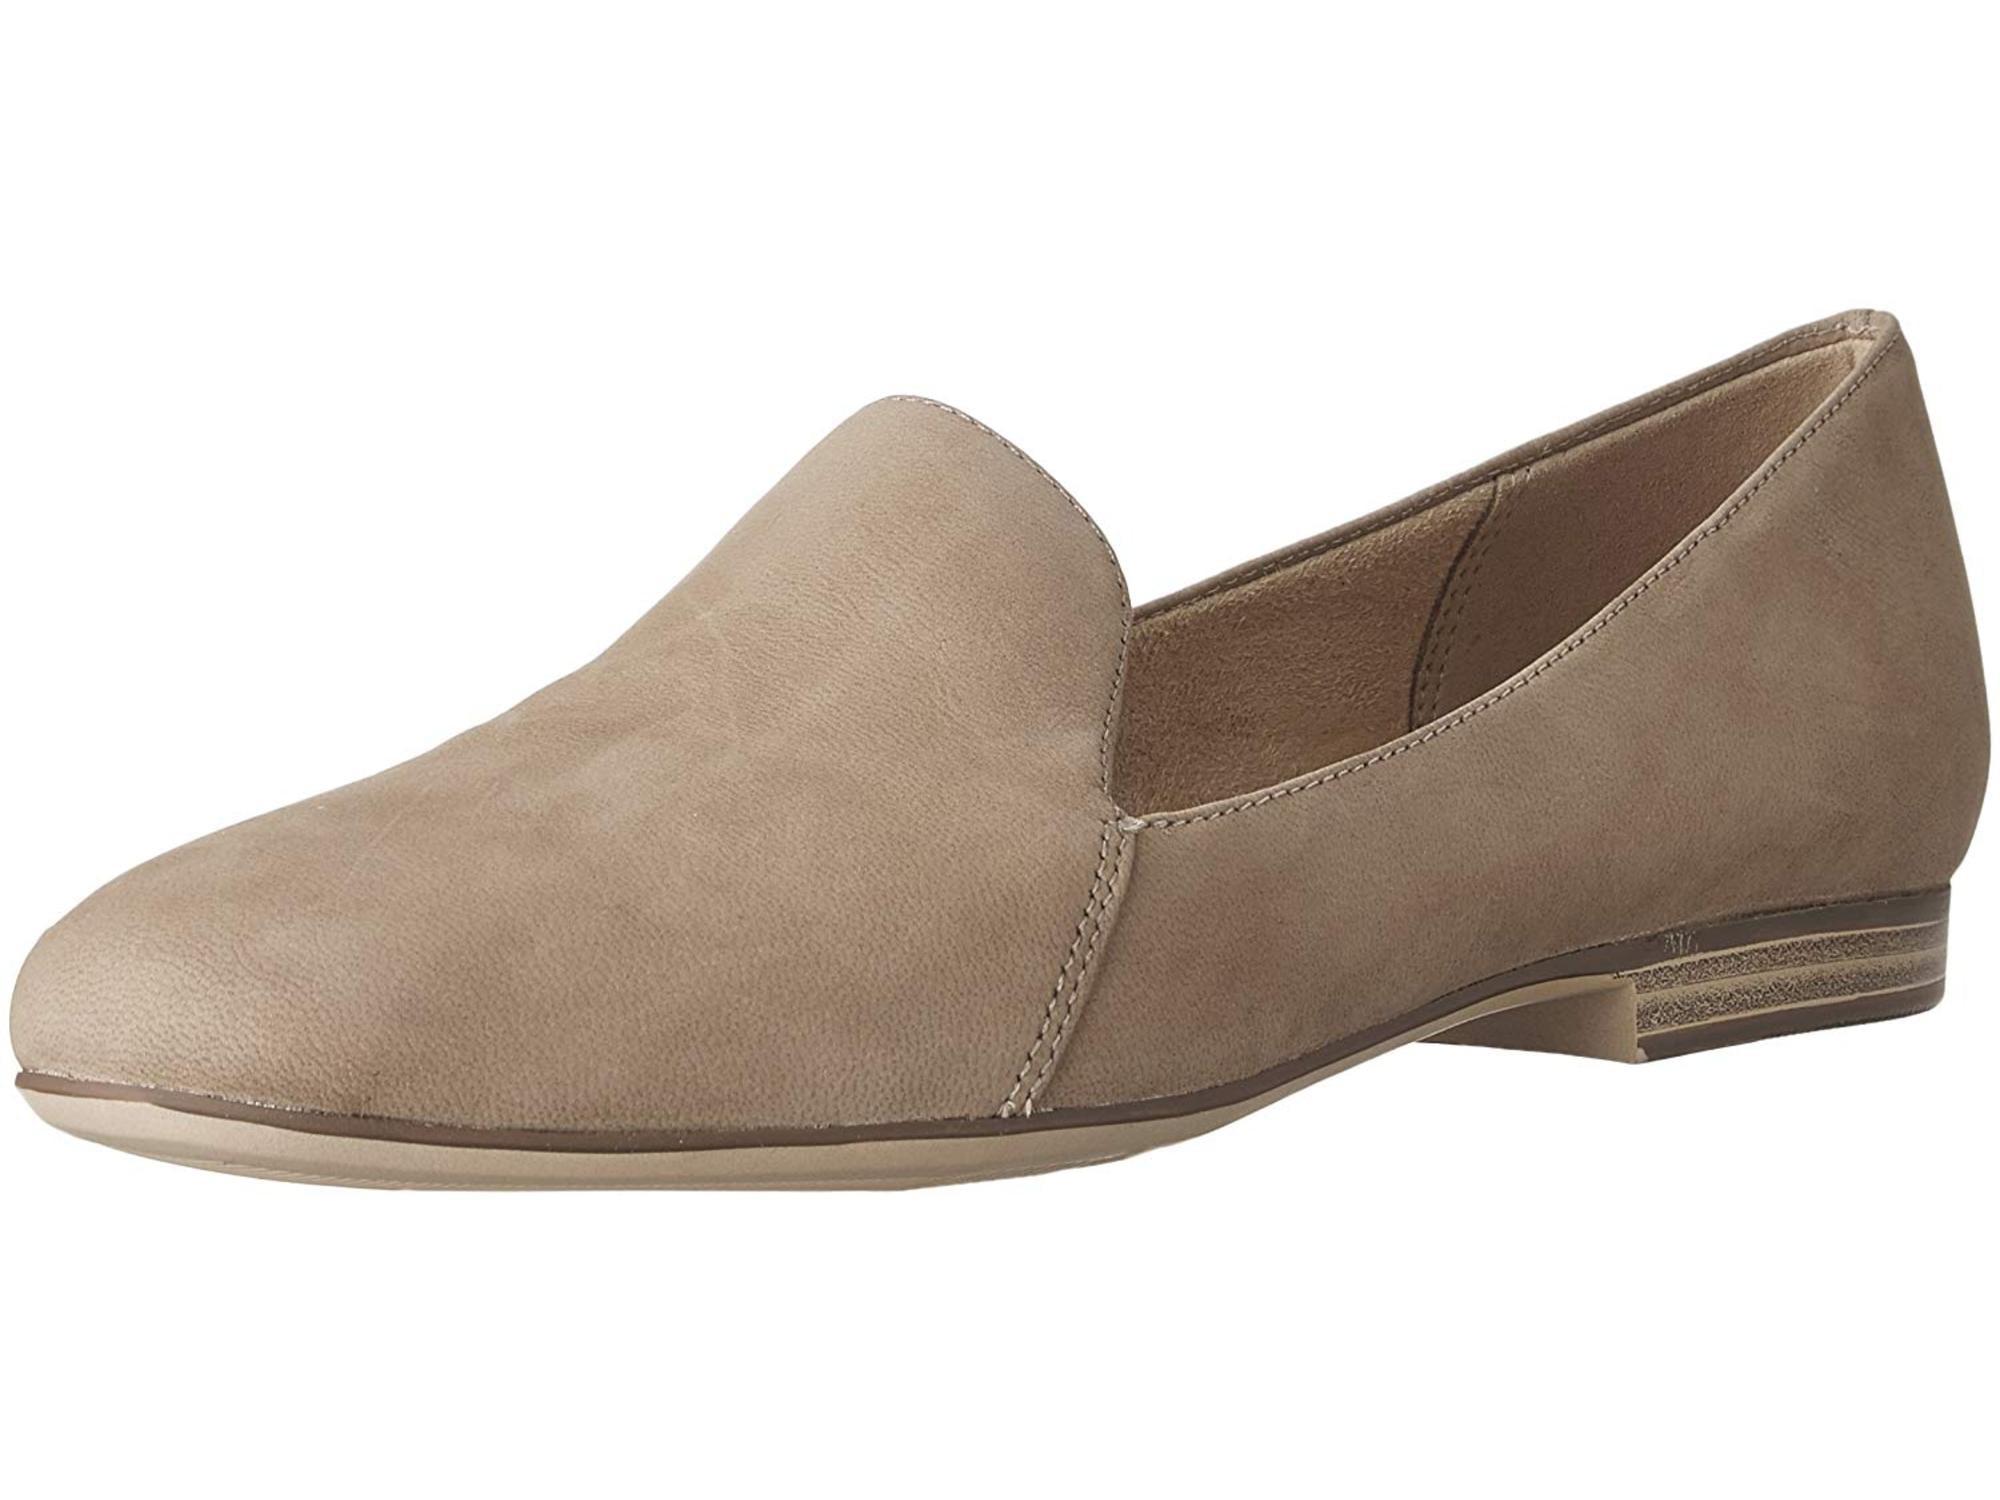 4e9694151d4 Naturalizer - Naturalizer Womens Emiline Leather Almond Toe Loafers -  Walmart.com